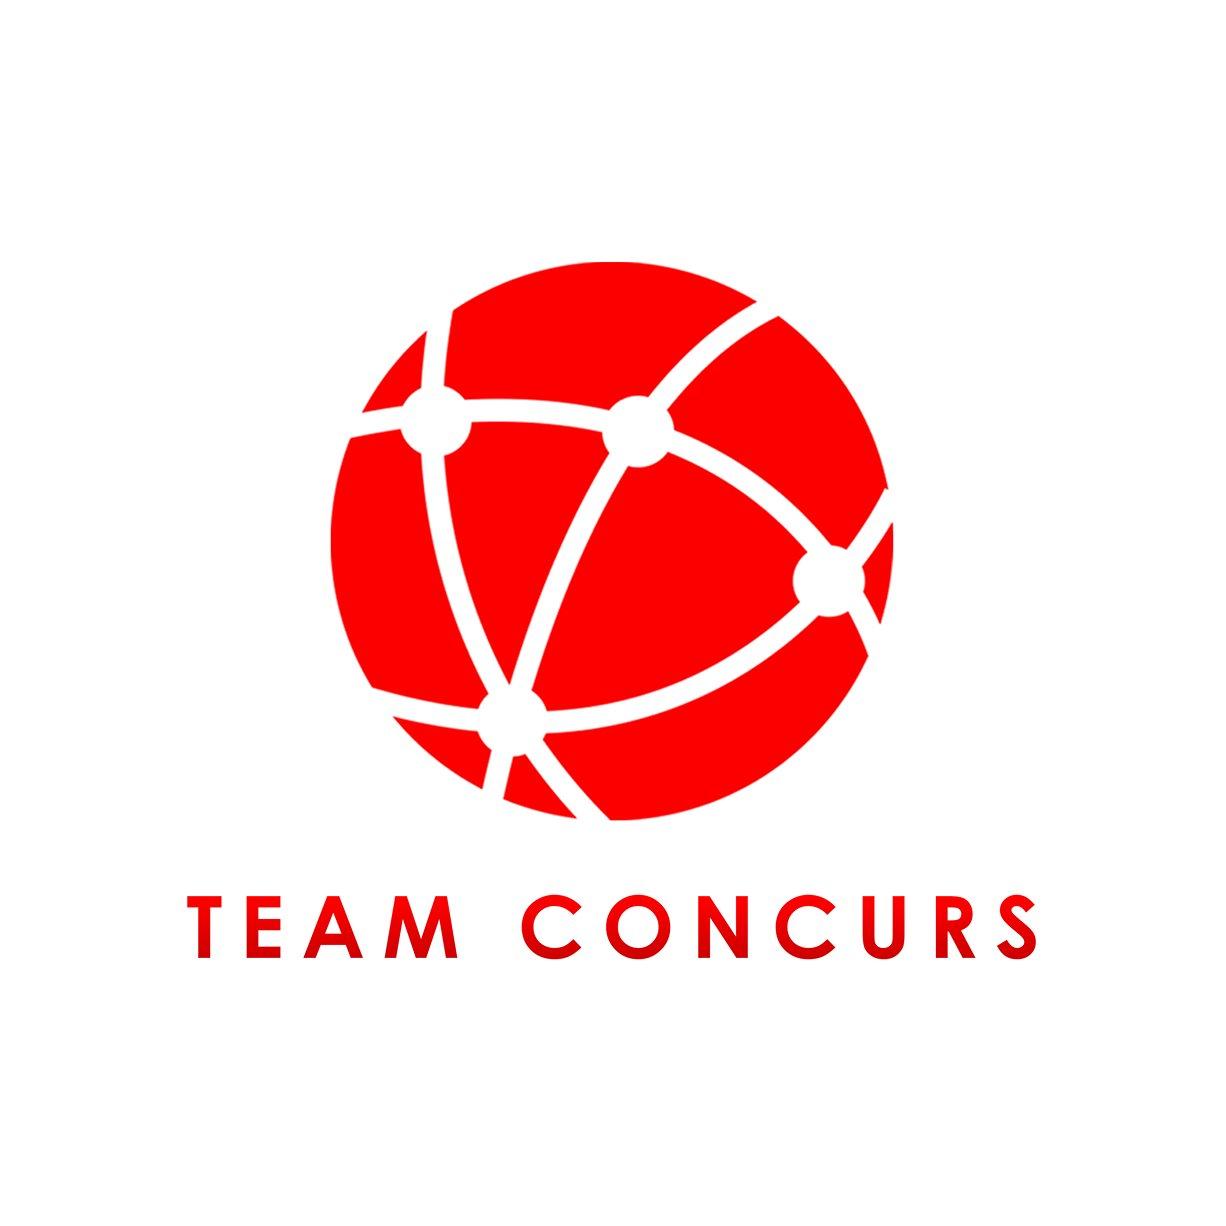 Team Concurs Pte Ltd